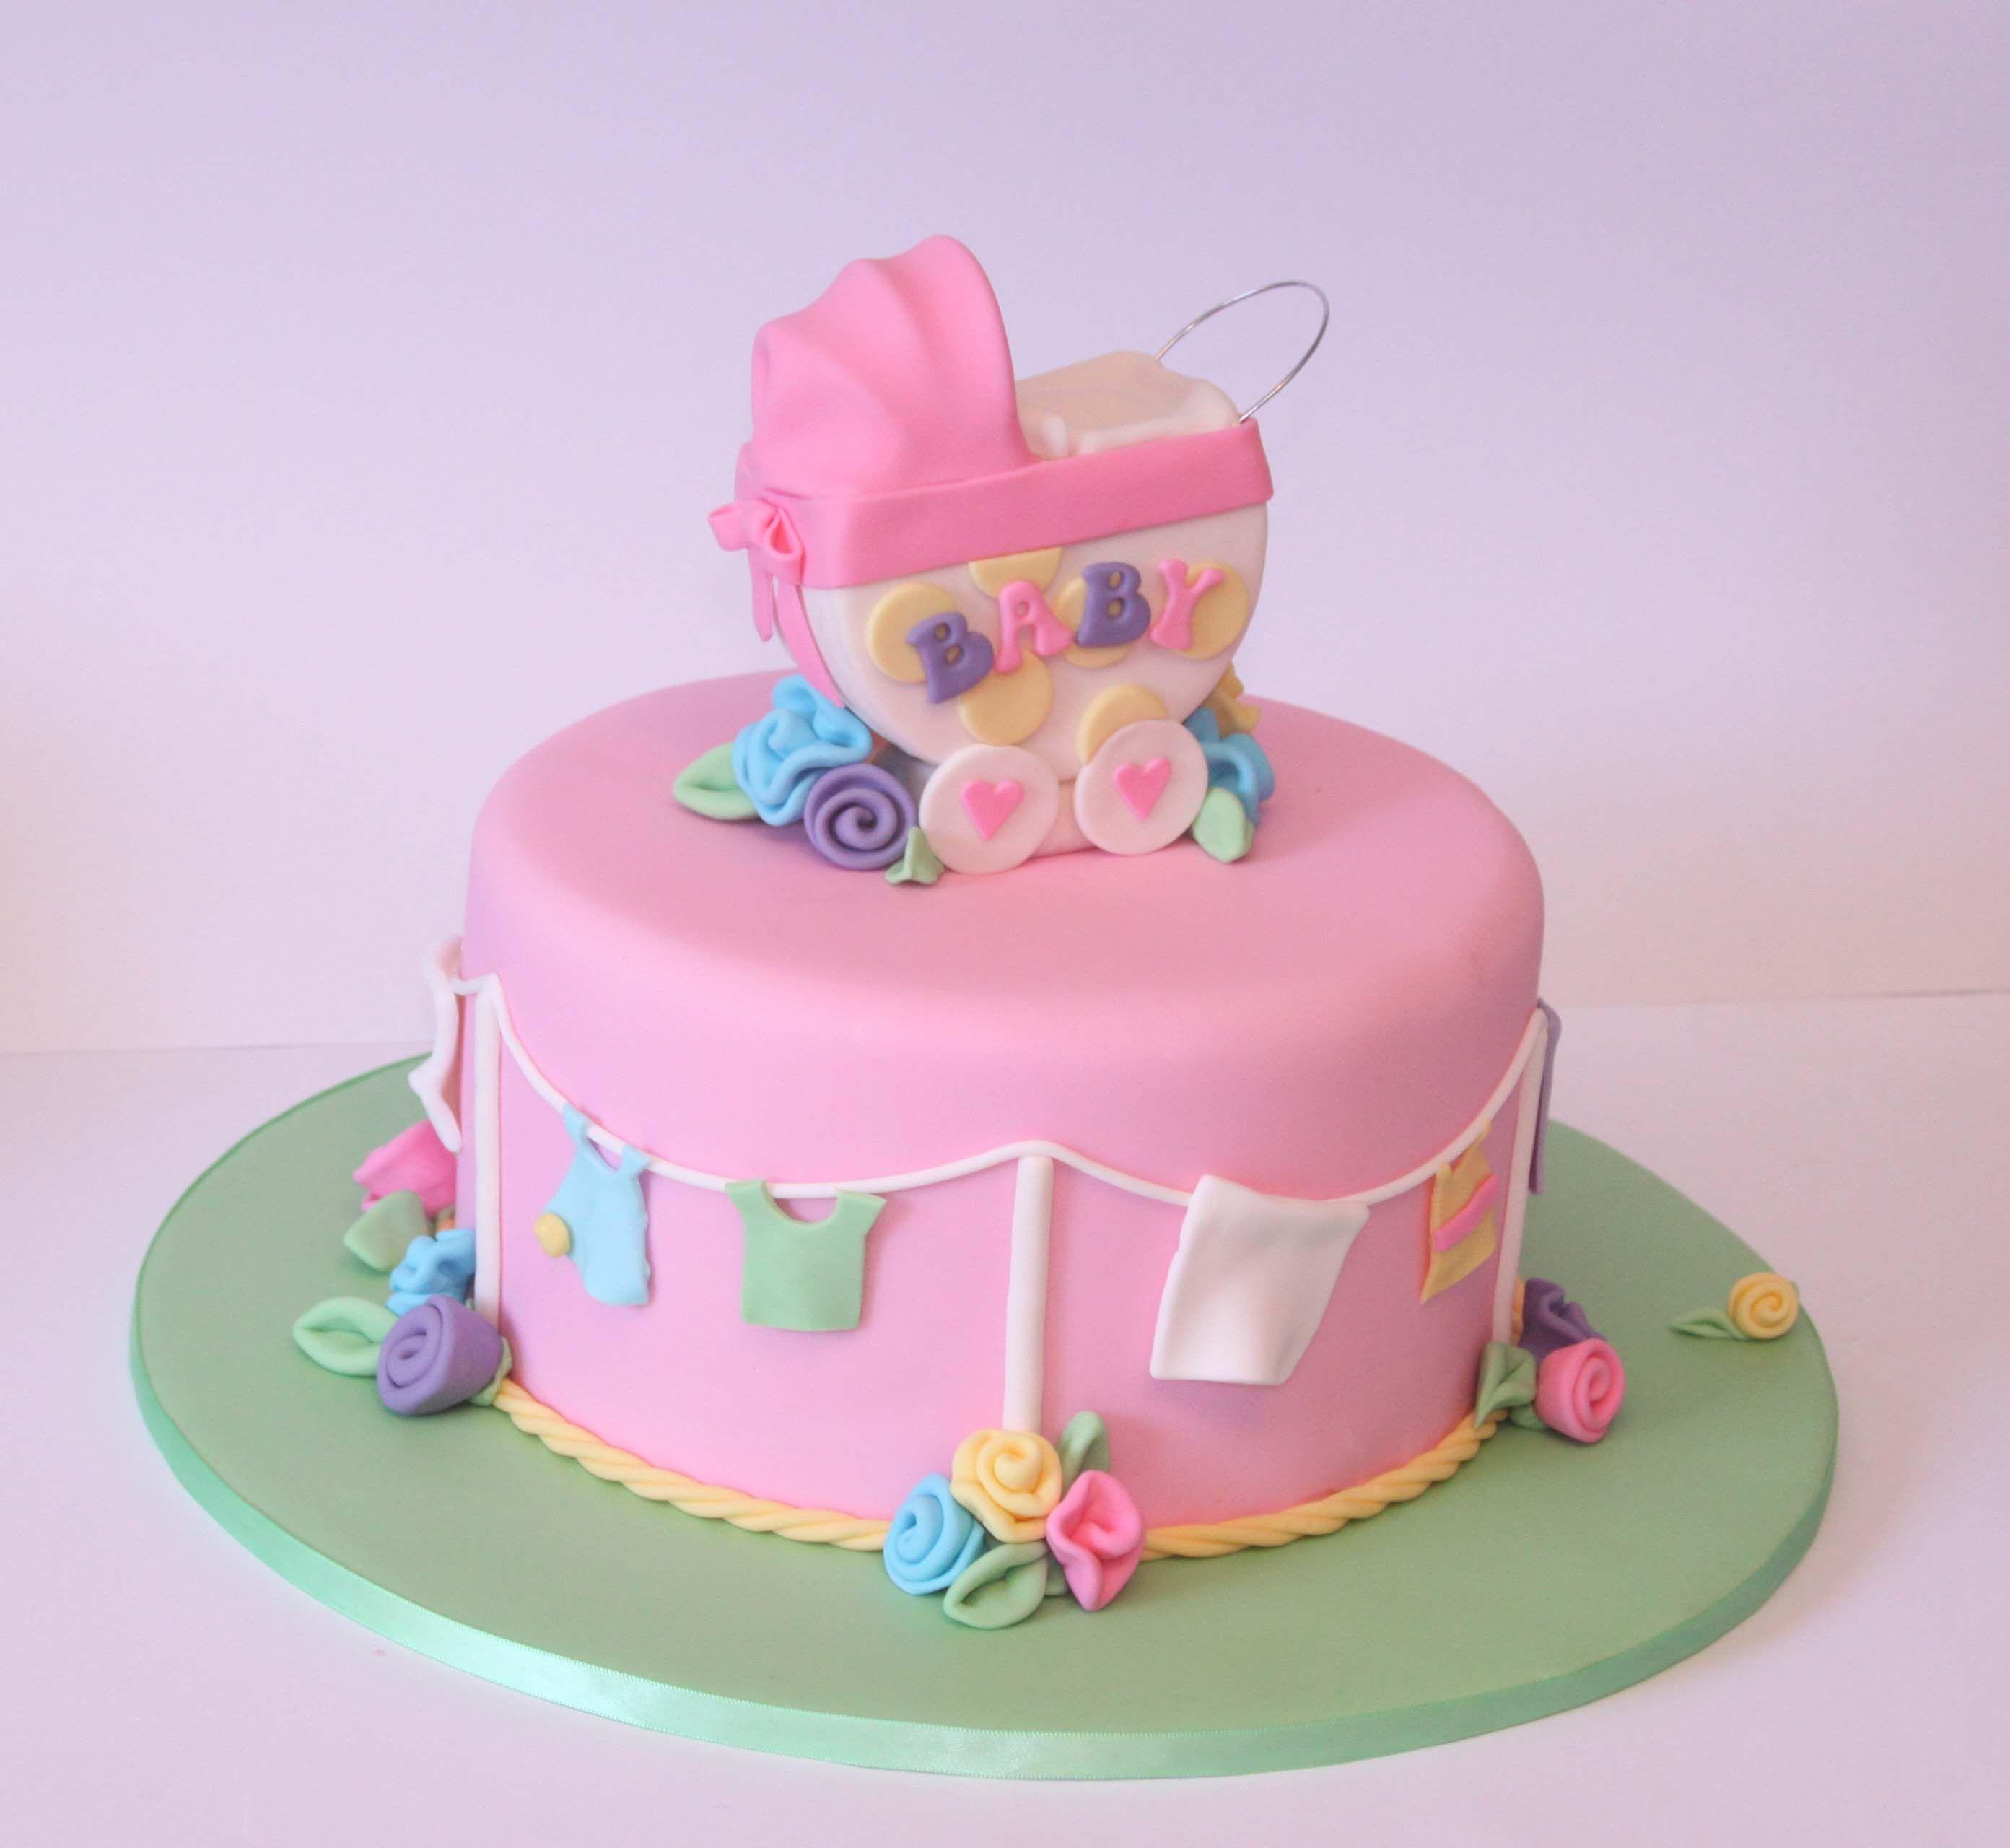 girl baby shower themes best cake for girl baby shower ideas2785 x